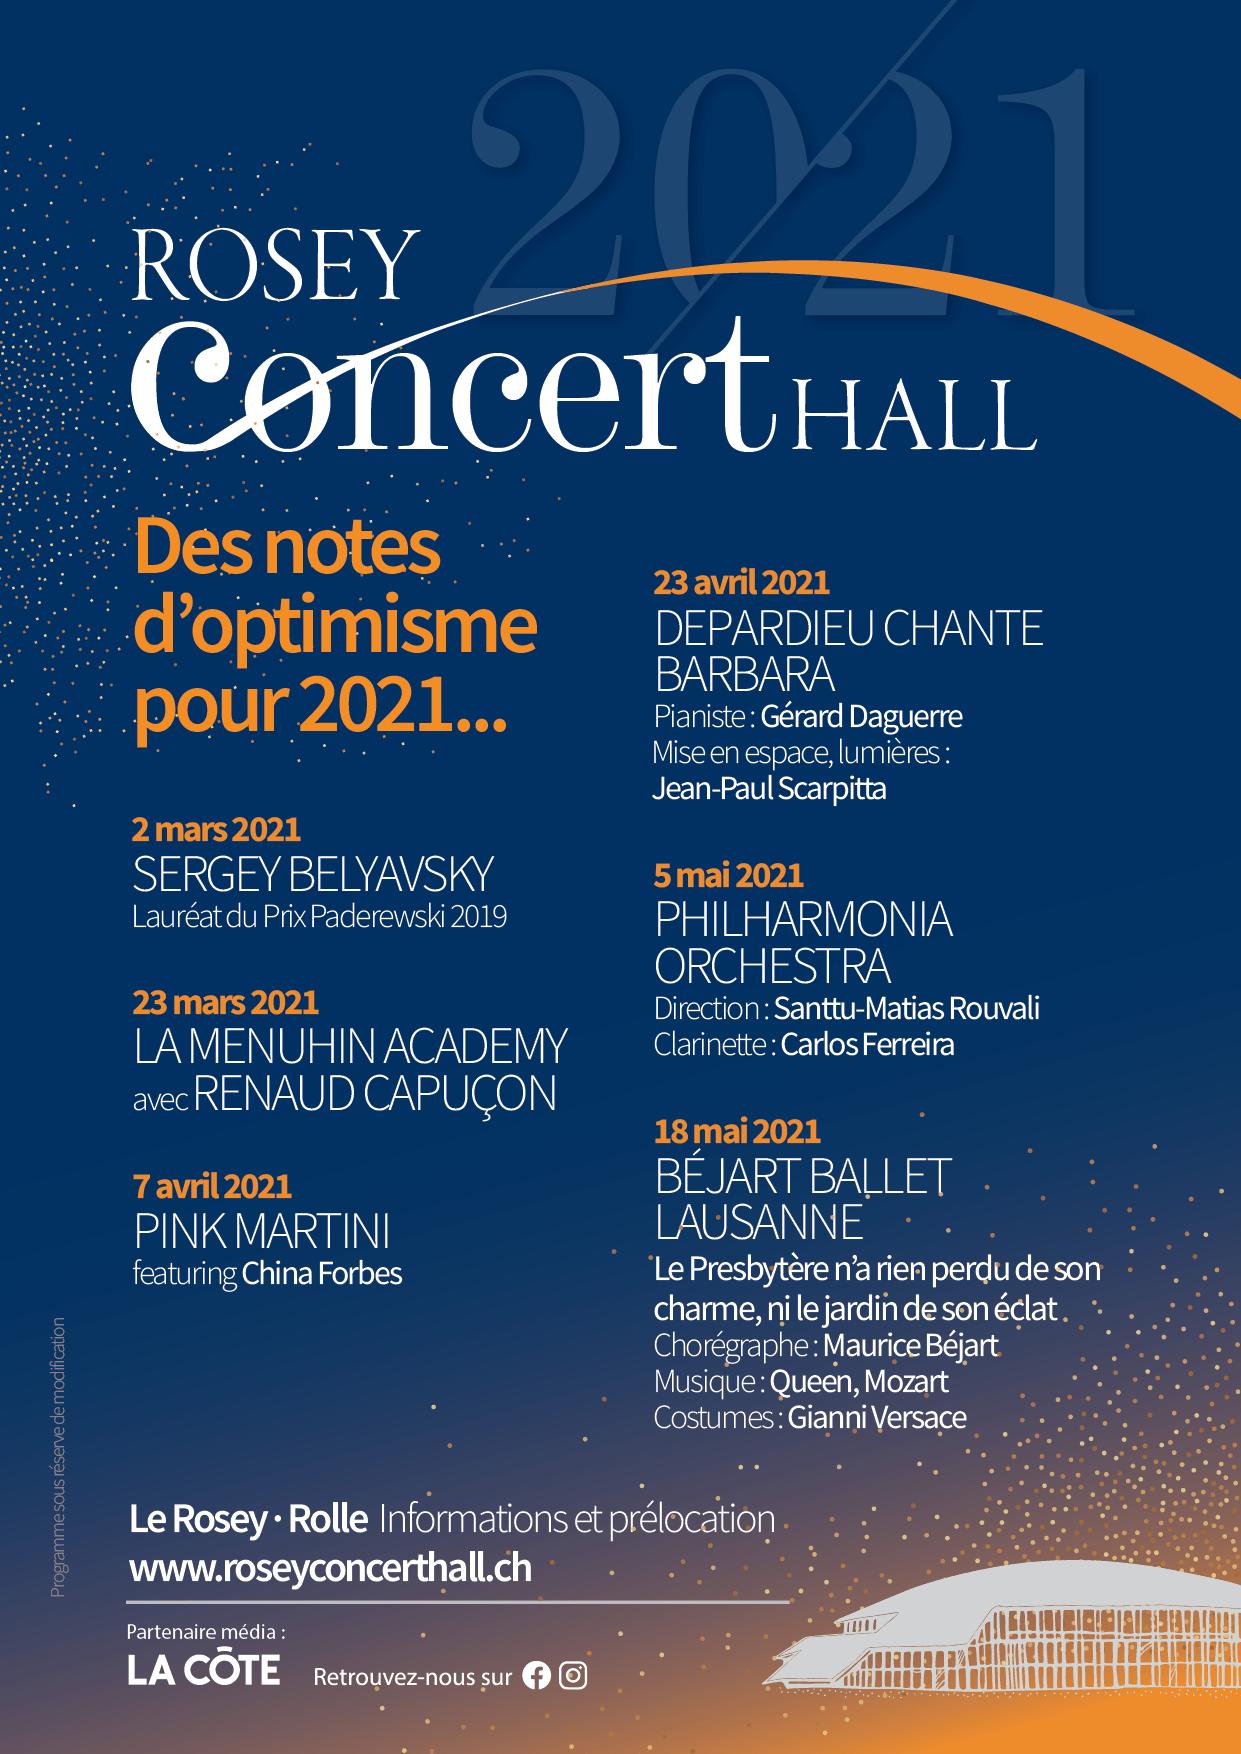 Rosey Concert Hall demi-saison 2020-21